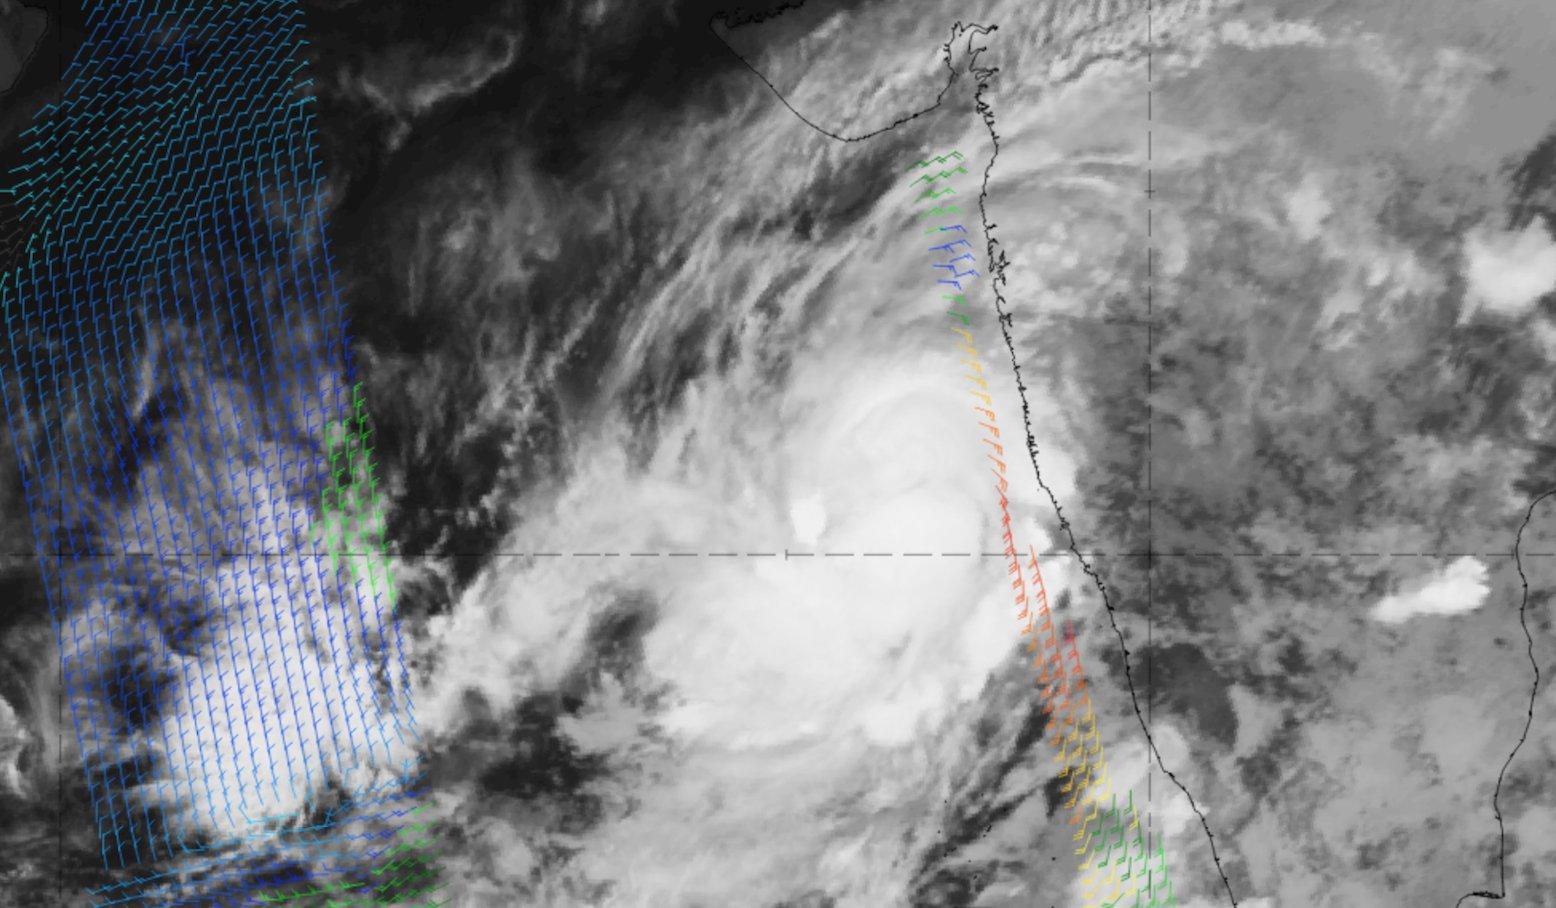 Meteosat-8 IR10.8 with Metop-A ASCAT winds overlaid, 24 Oct 18:00 UTC